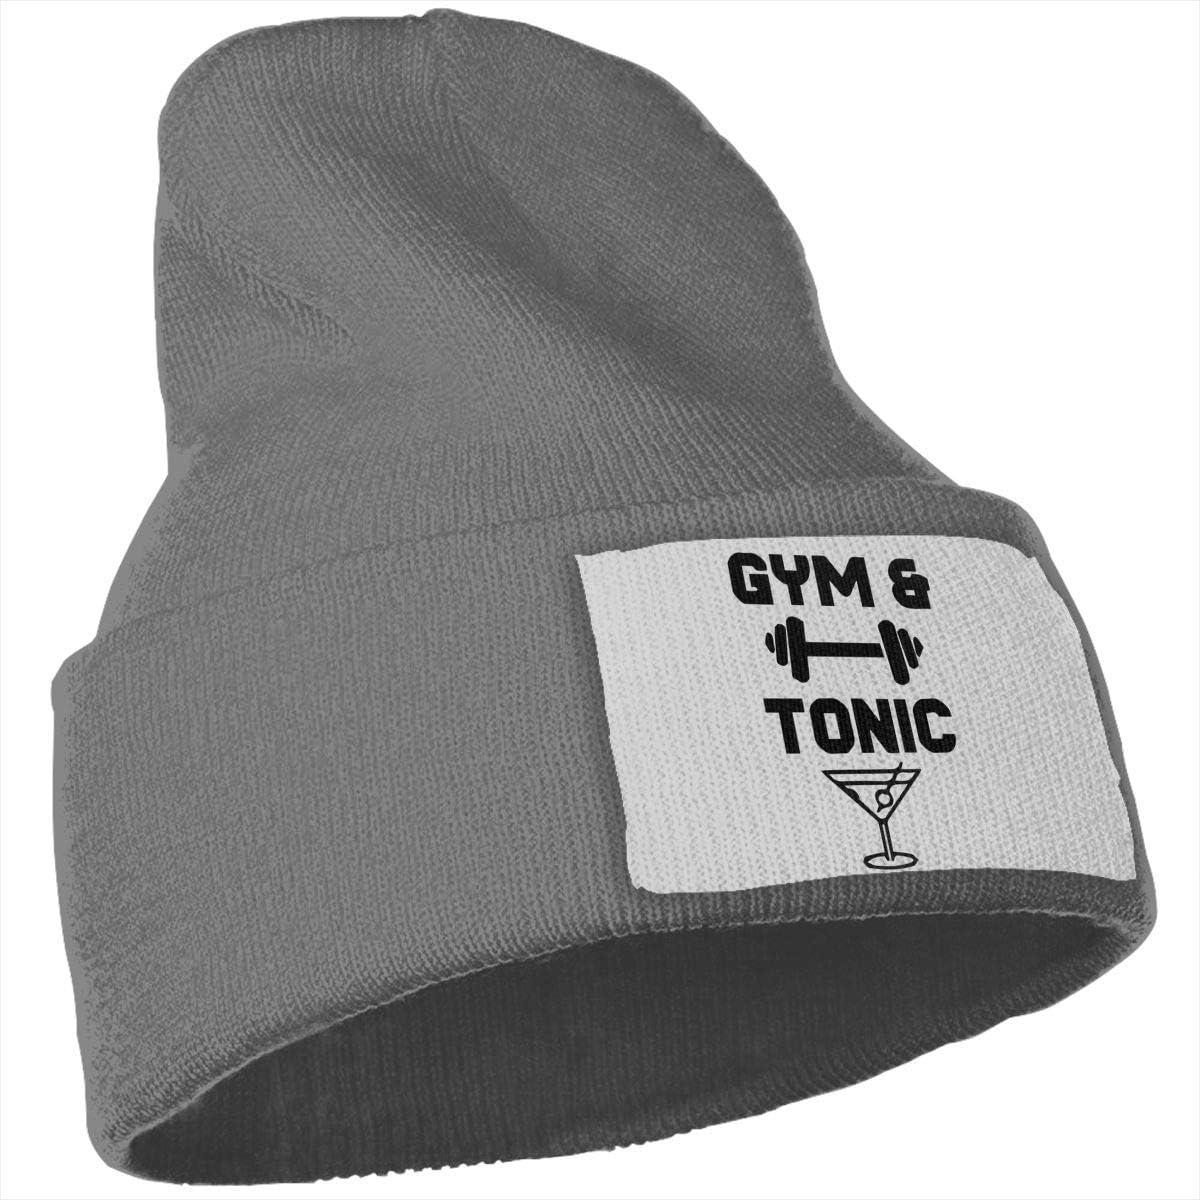 Gym and Tonic Original Skull Cap Mens Womens 100/% Acrylic Knit Hat Cap